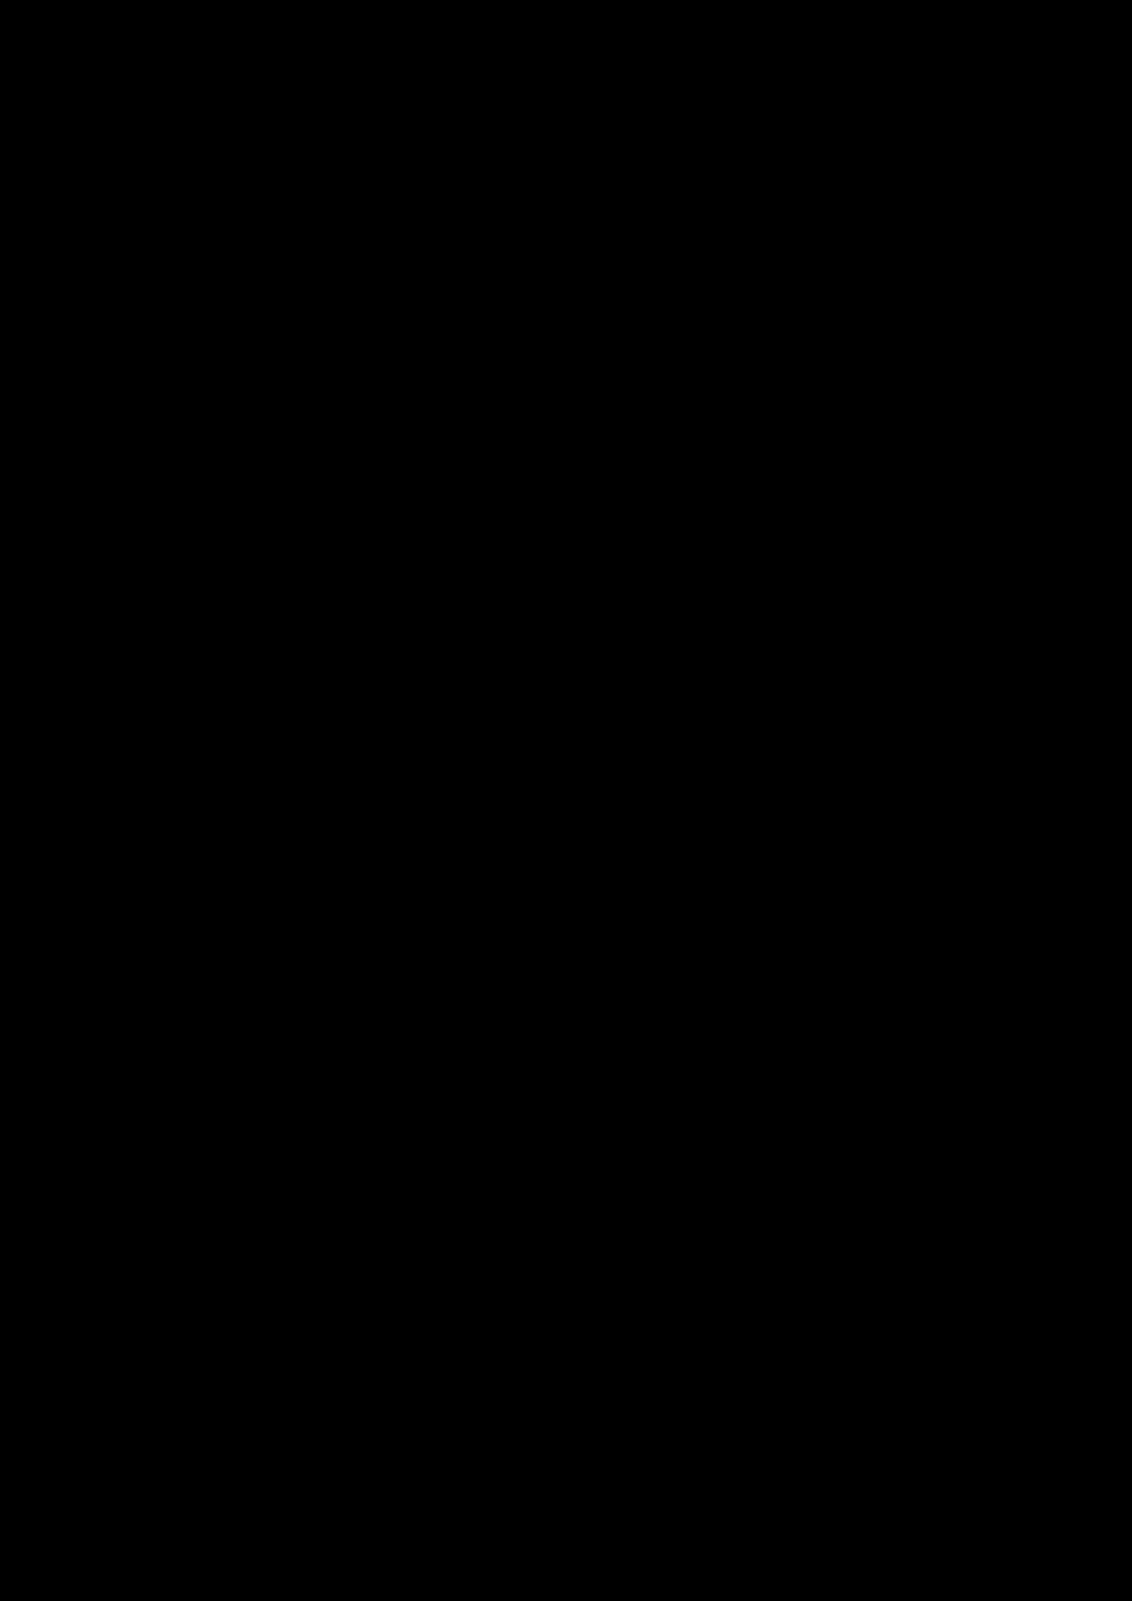 Ten lyubvi slide, Image 37